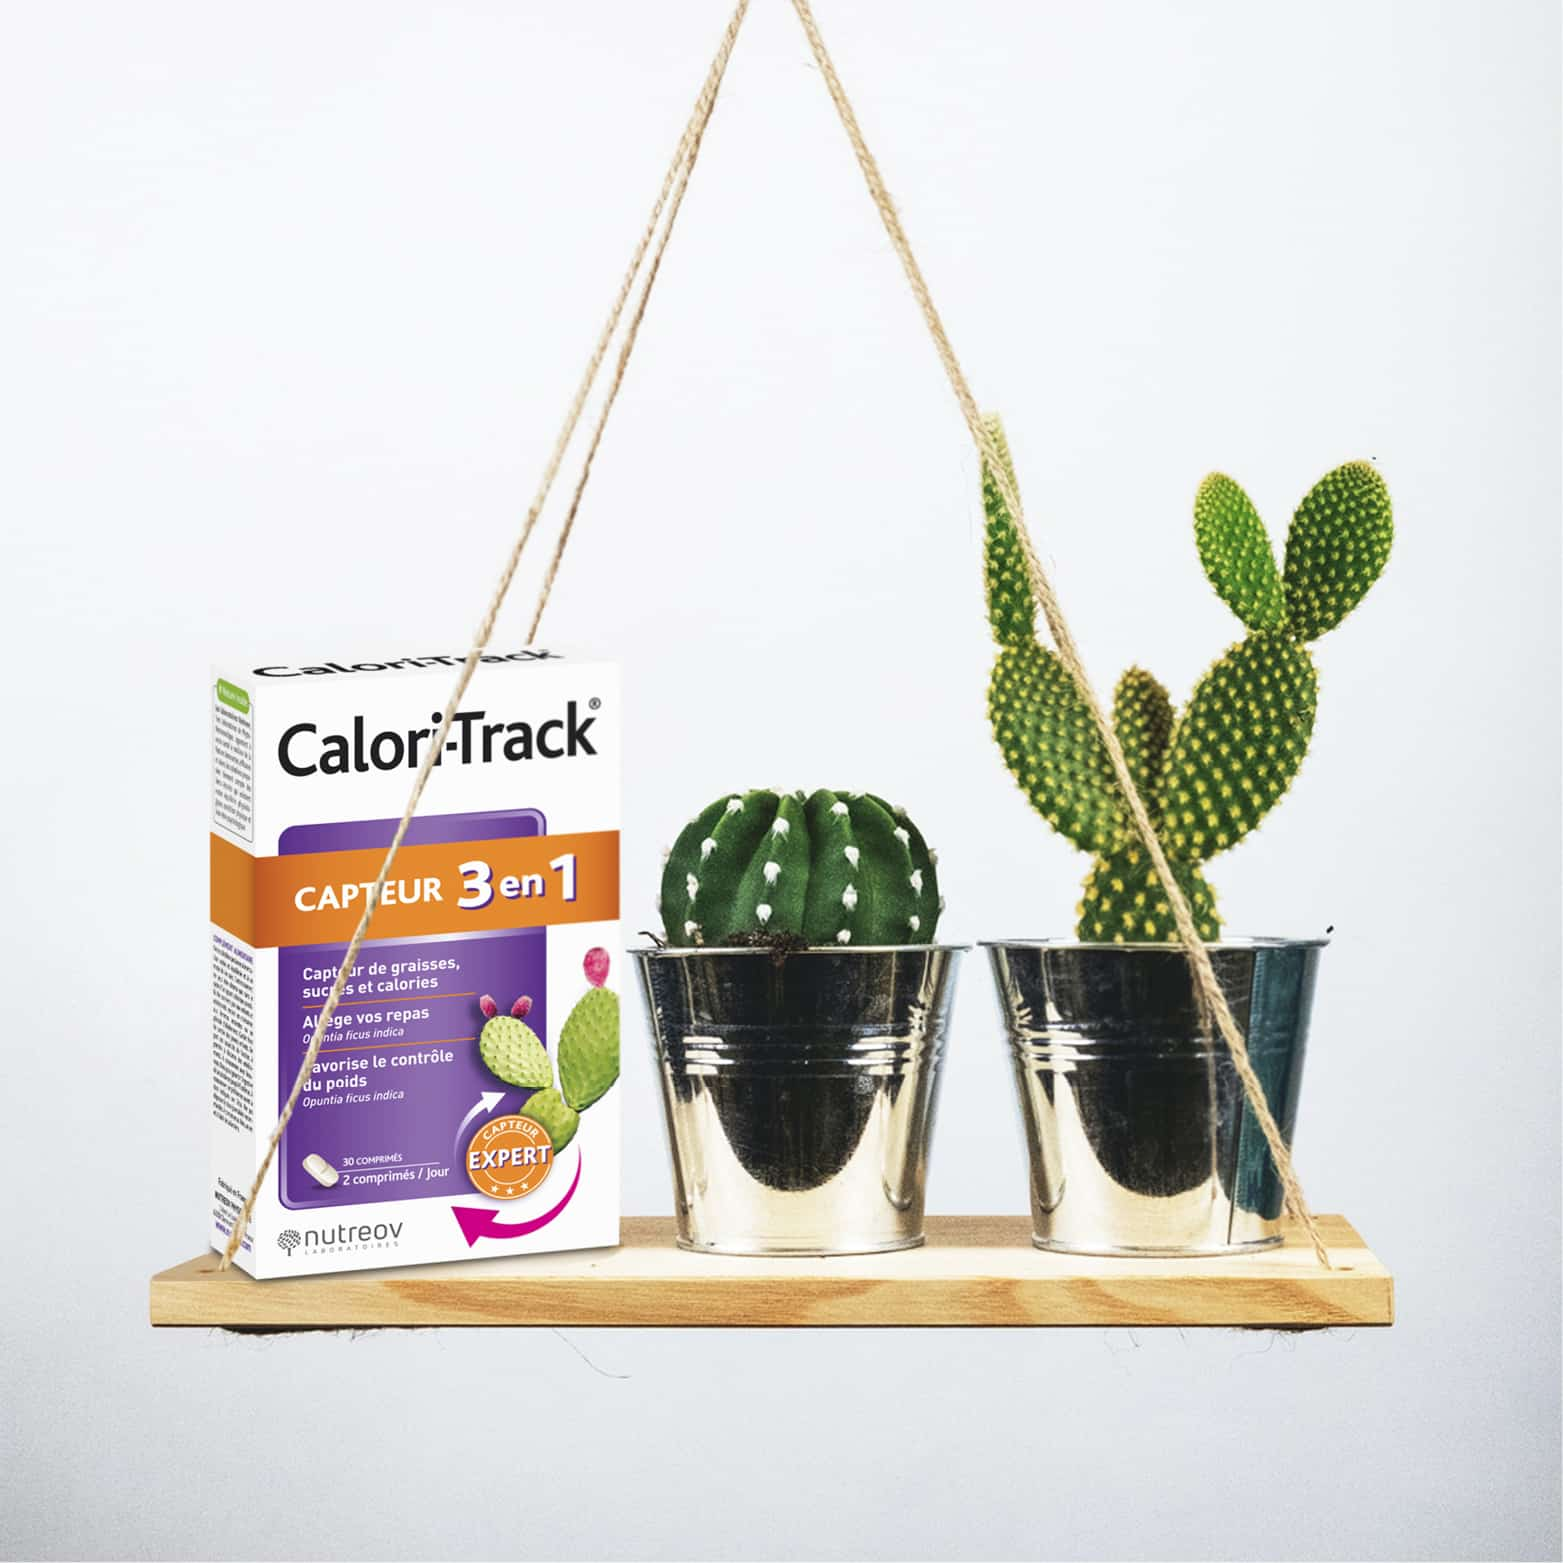 Calori-Track® Capteur 3 en 1